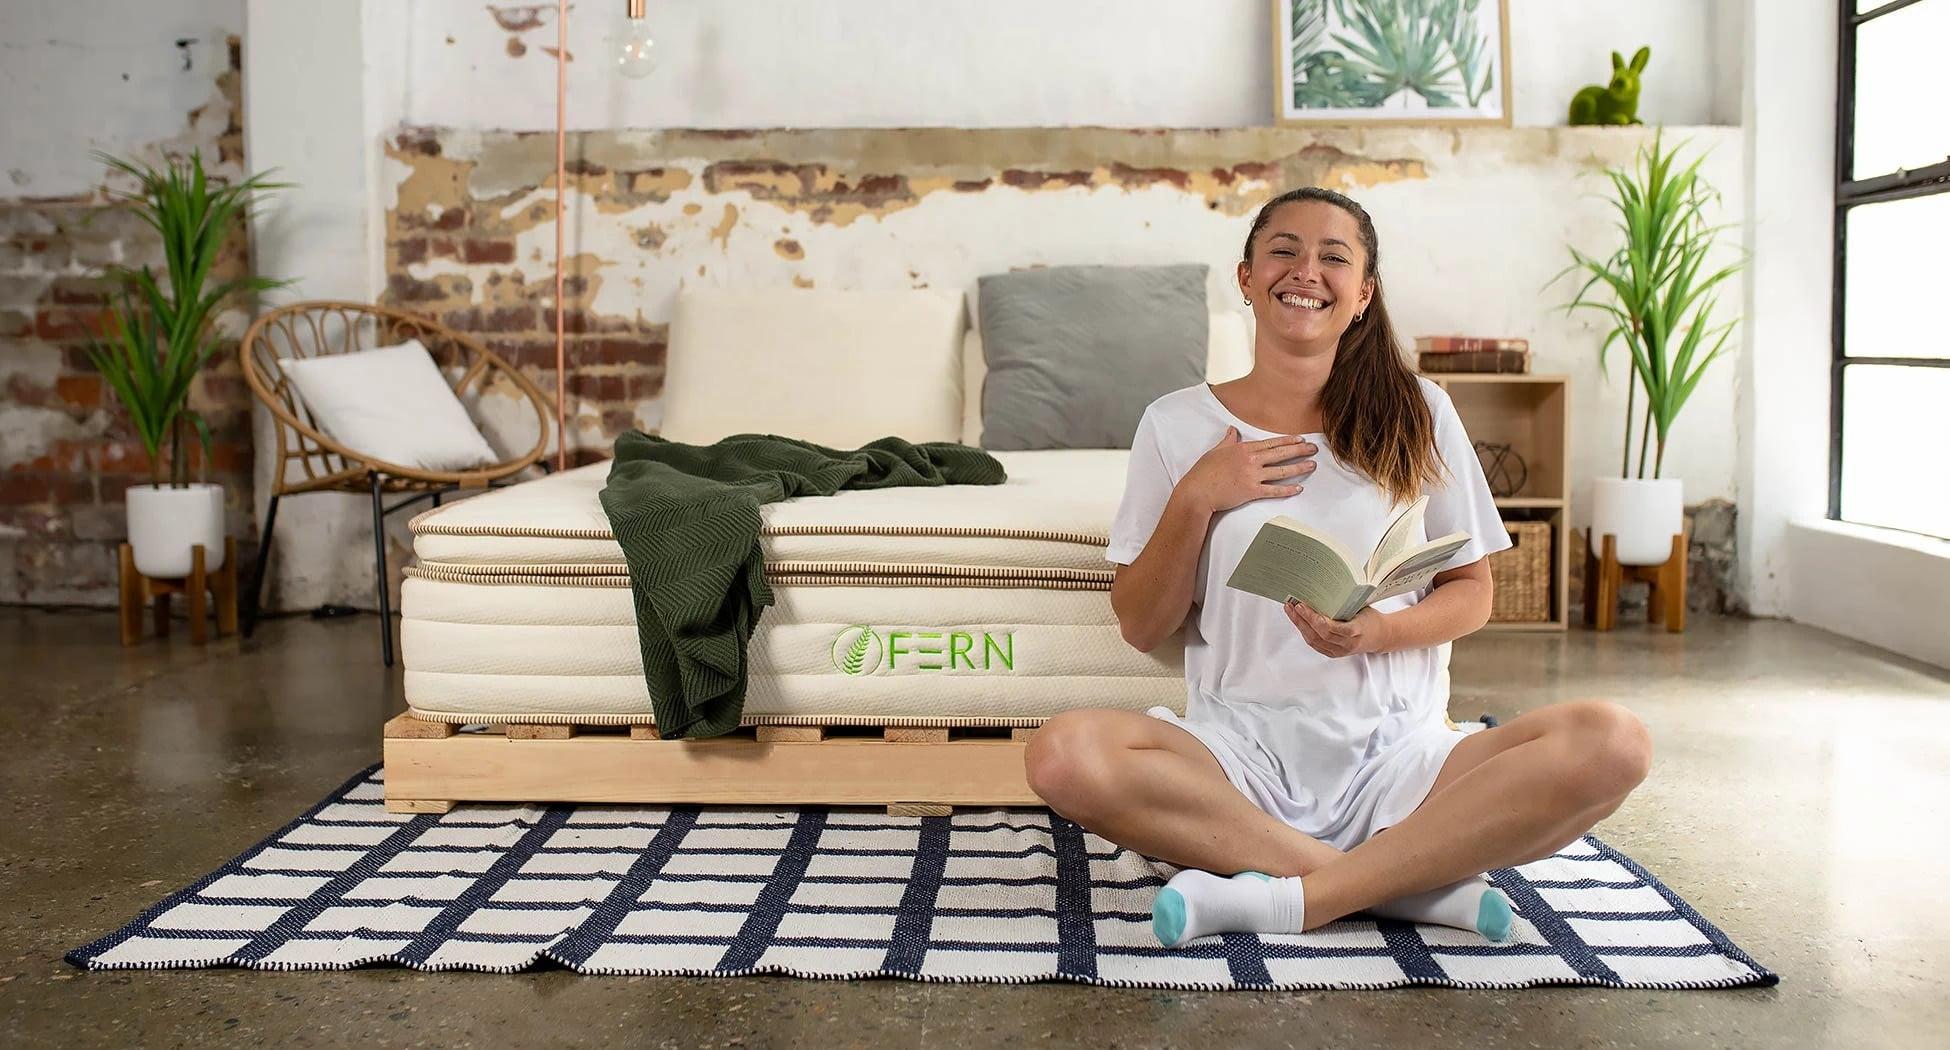 Non-toxic and eco-friendly mattresses